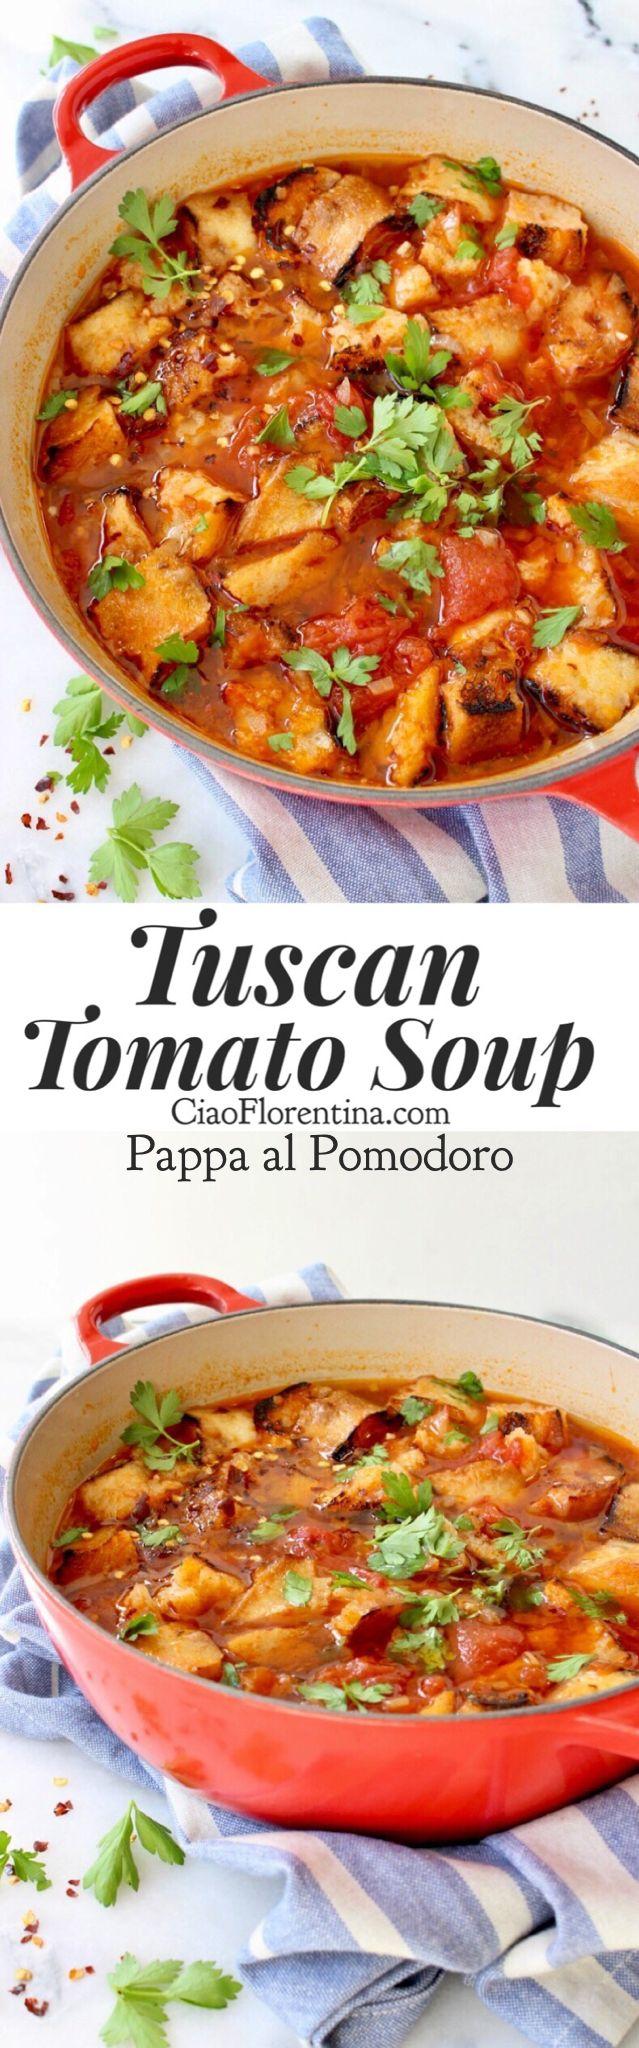 Authentic Tuscan Tomato Soup Recipe or Pappa al Pomodoro with Bread and Herbs   CiaoFlorentina.com @CiaoFlorentina